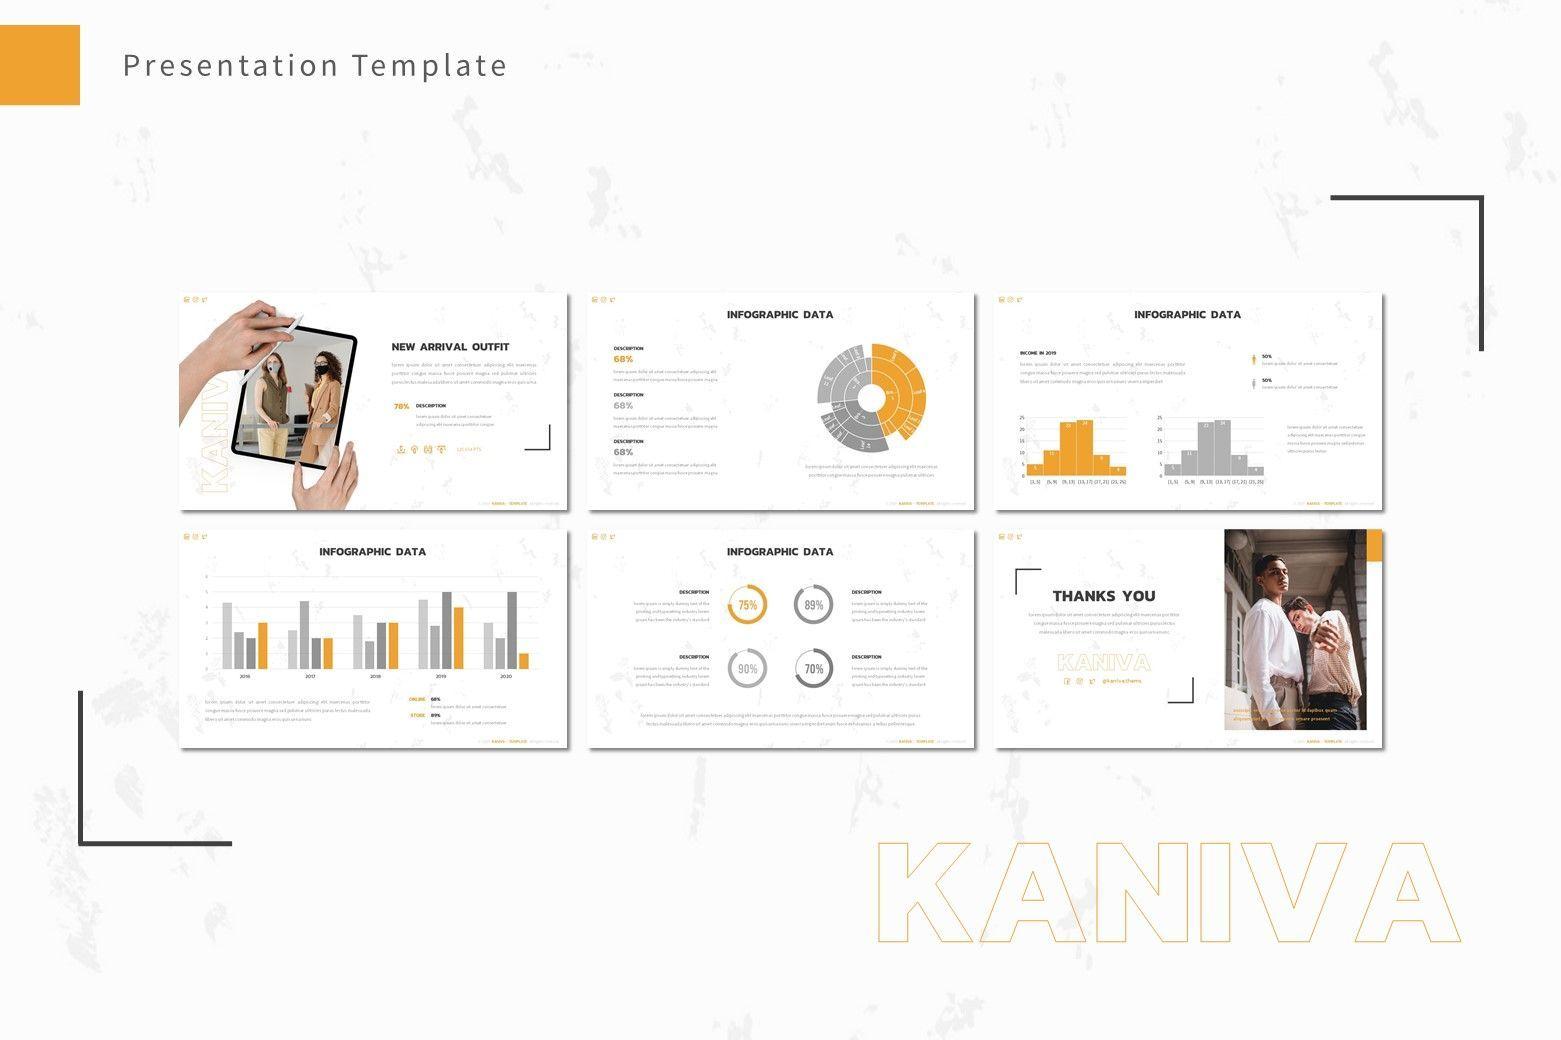 Kaniva - Powerpoint Template, Slide 4, 08001, Presentation Templates — PoweredTemplate.com